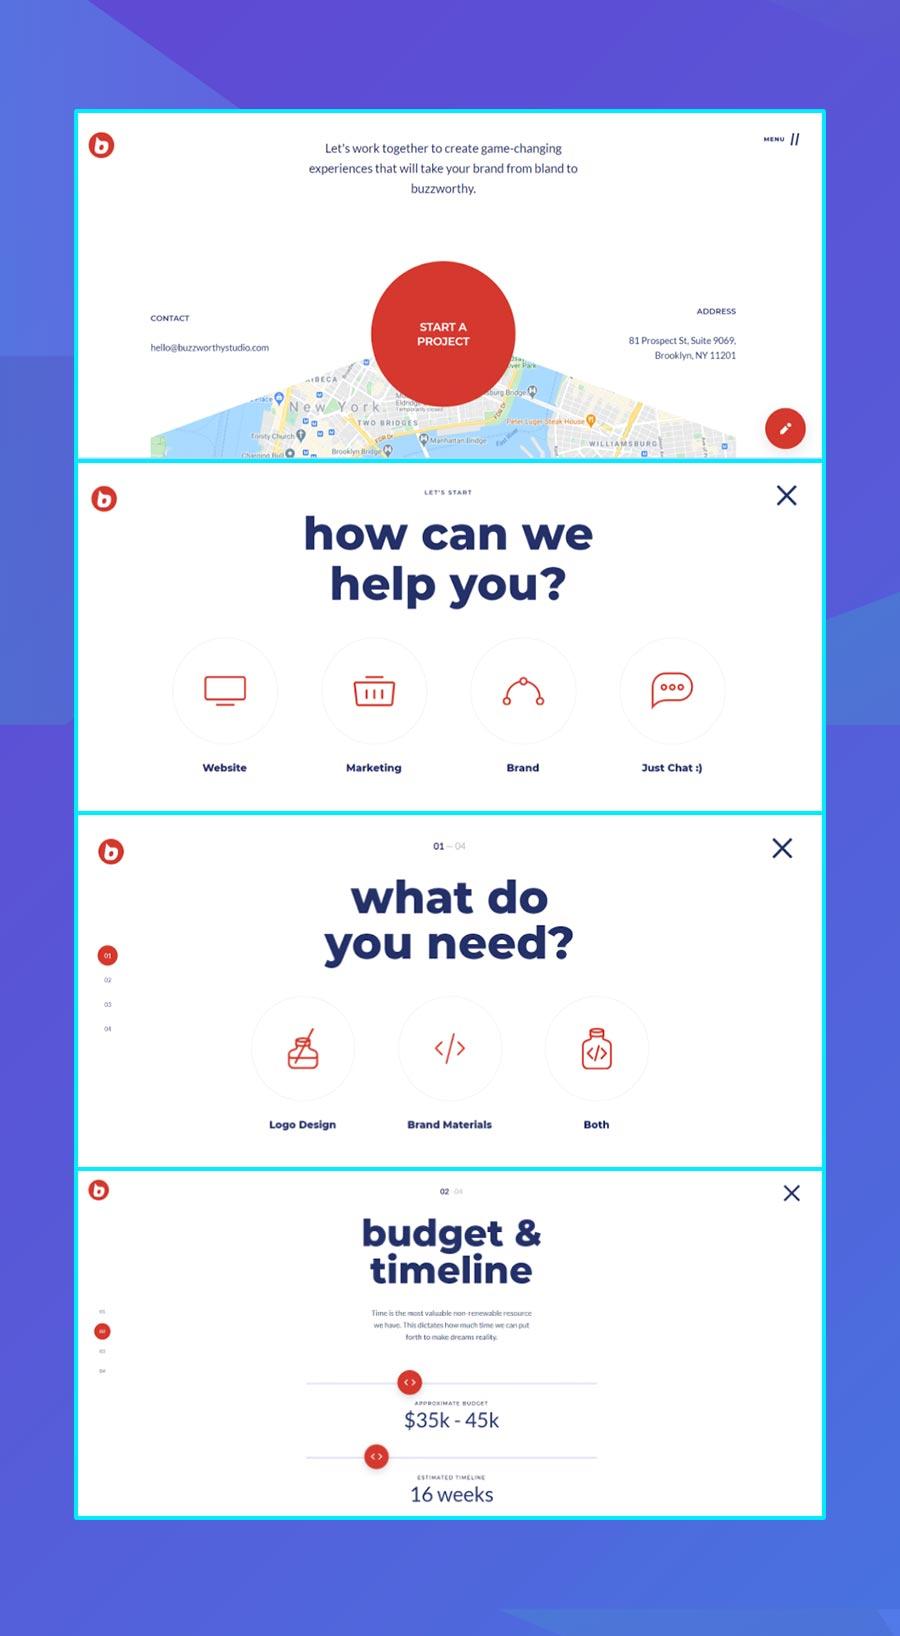 Modern website design: Buzzworthy Studios' conversational UX